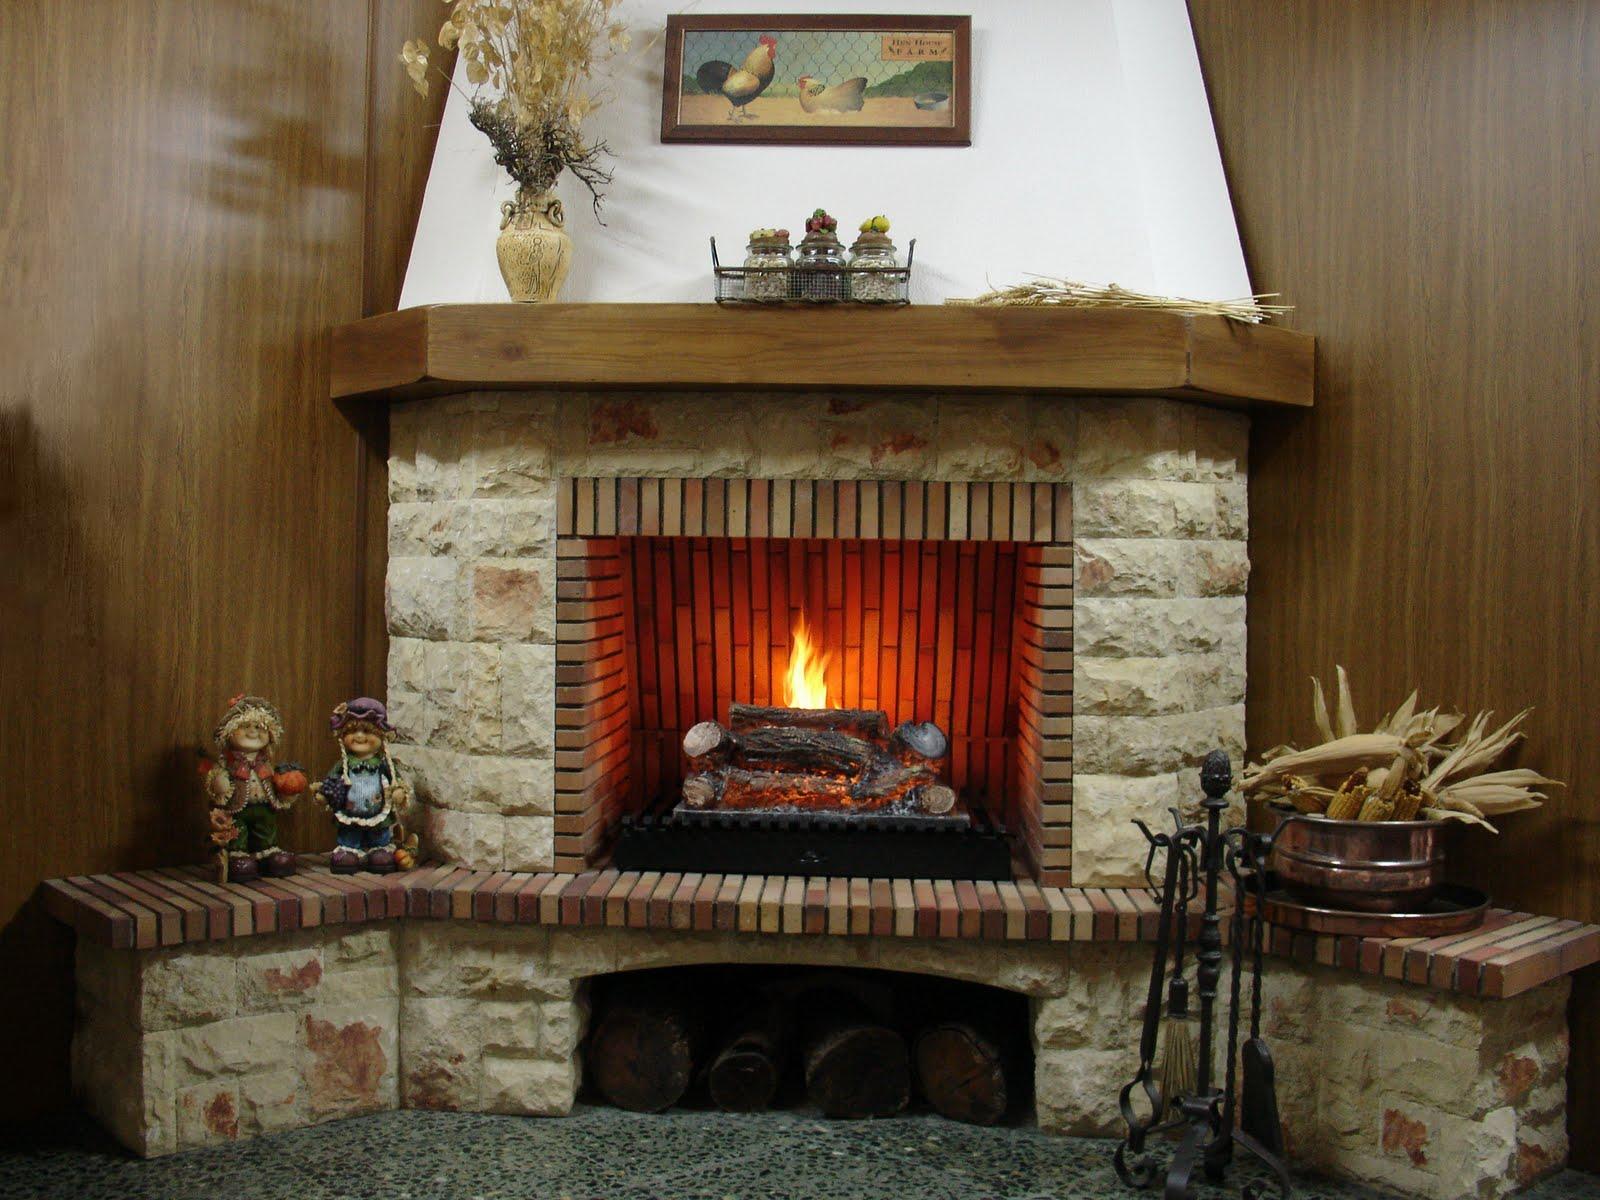 La palmera negra la chimenea - Chimenea de gas natural ...